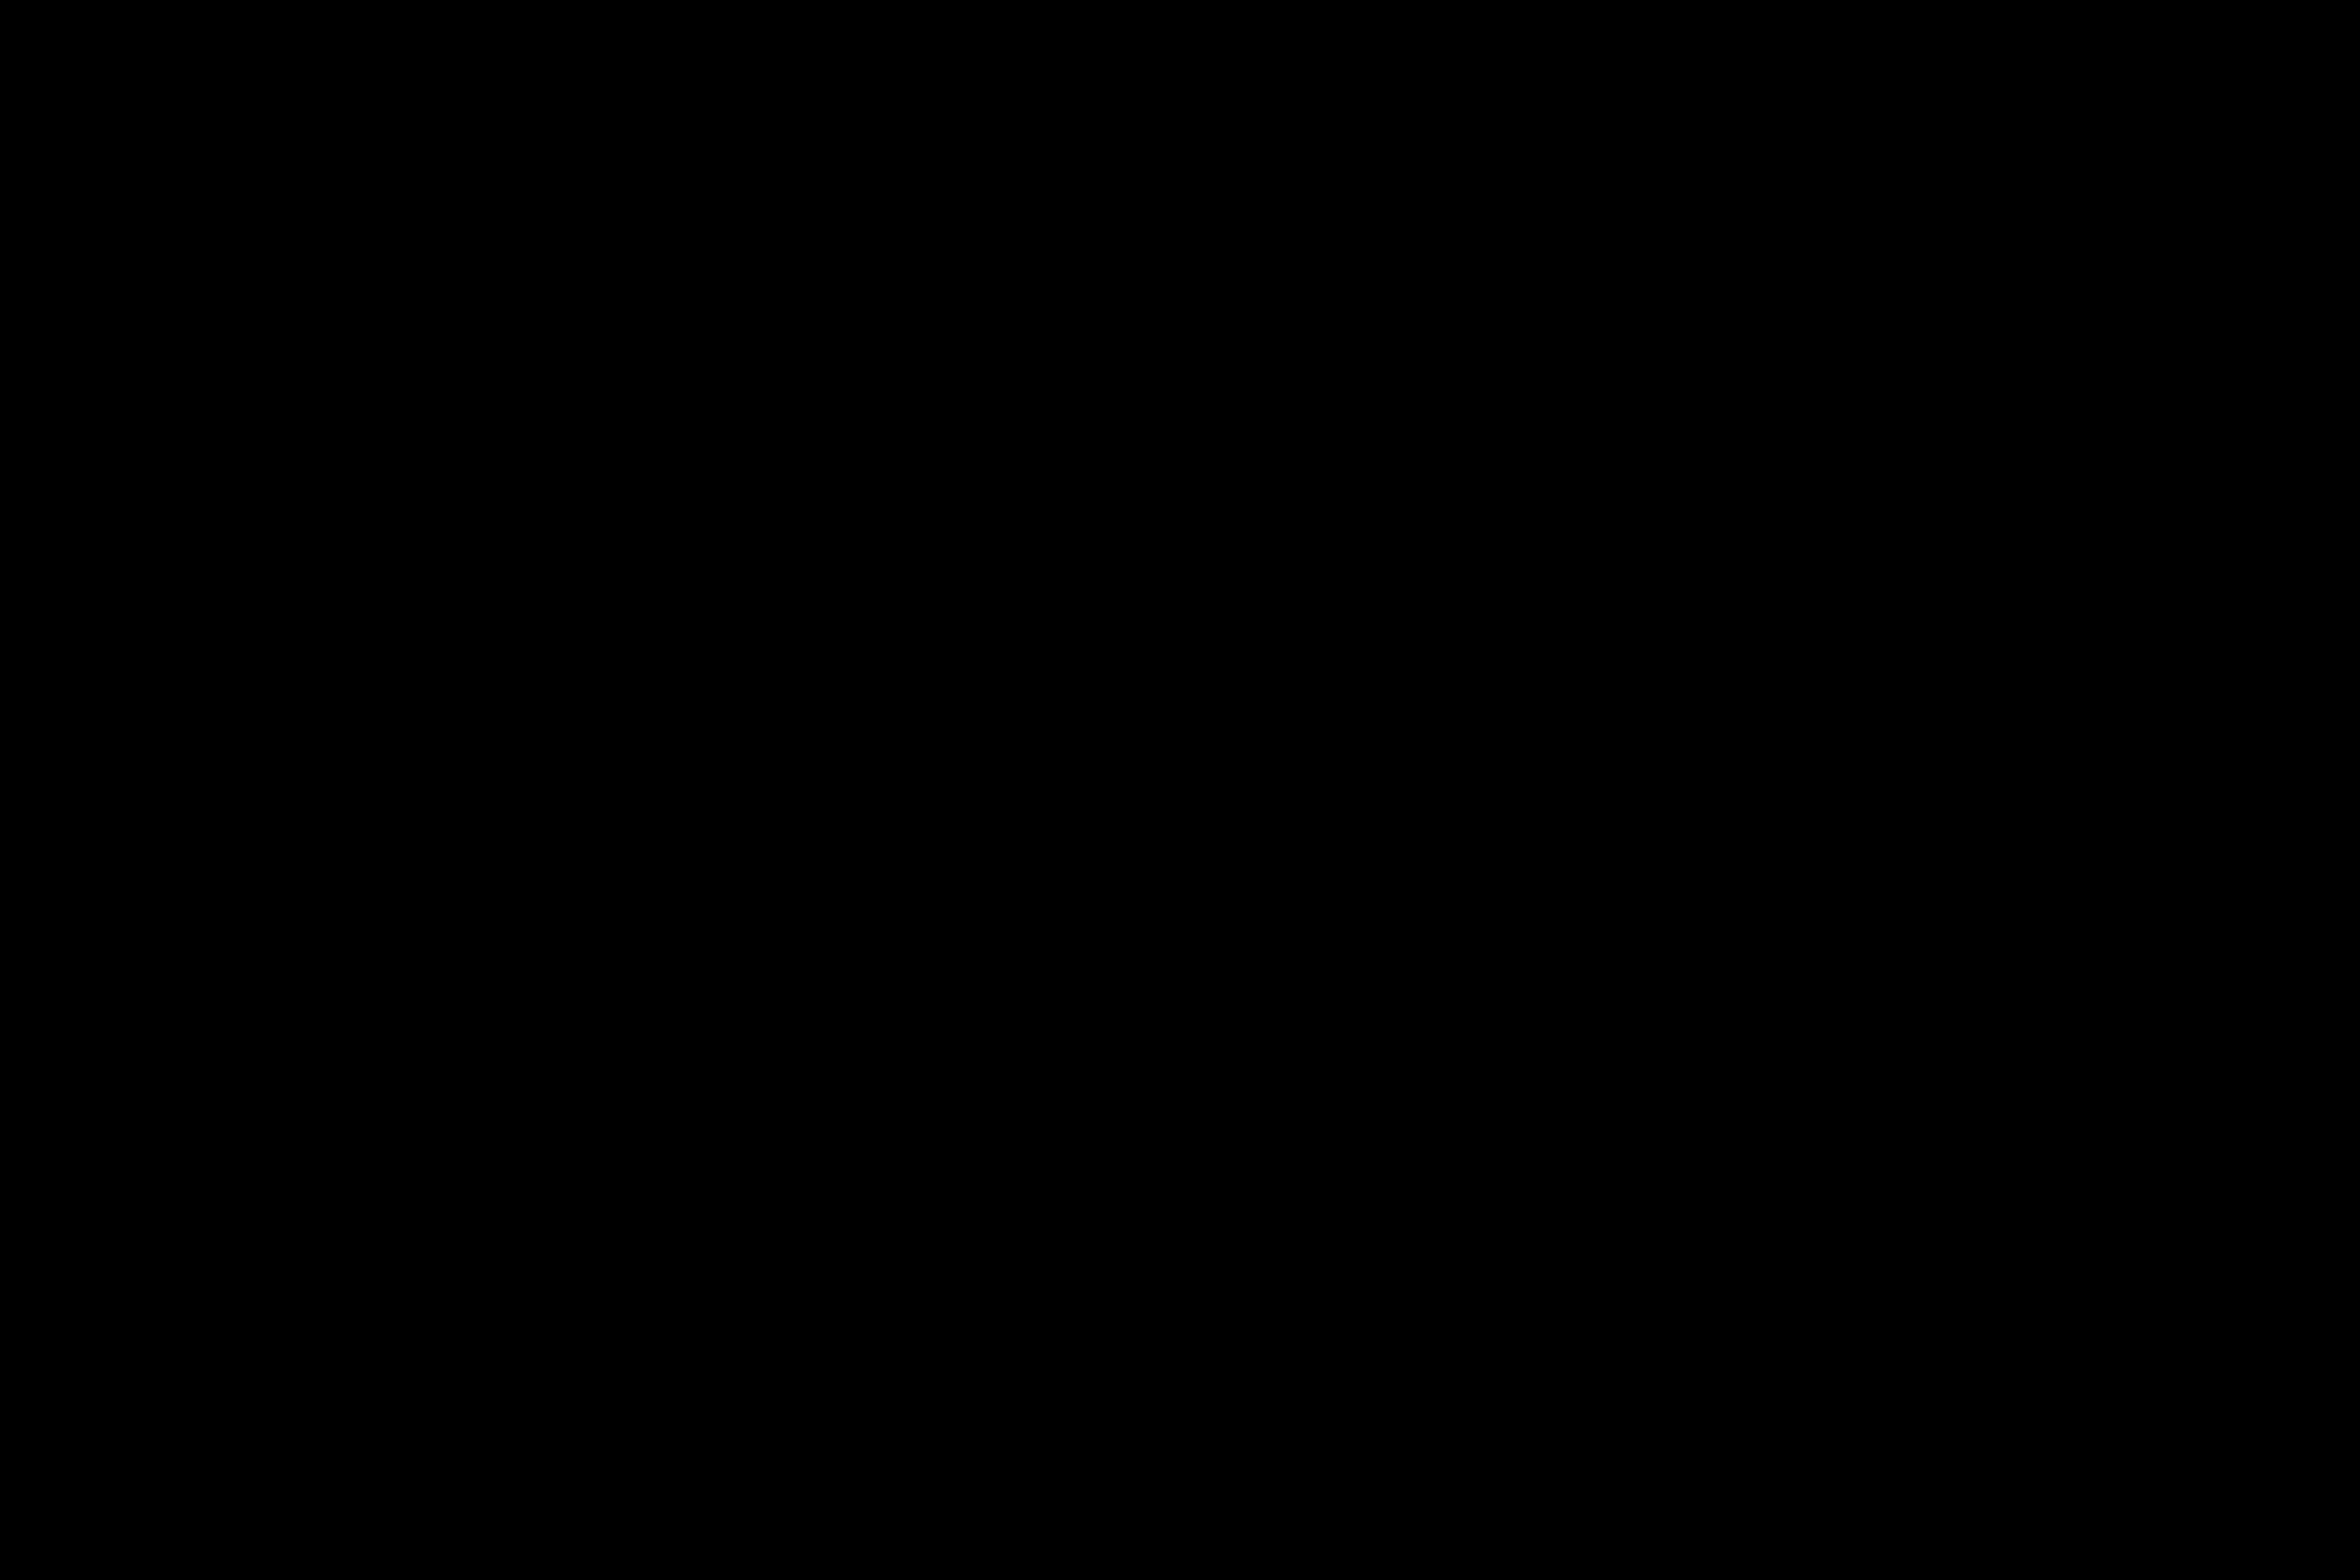 gct-logo.png